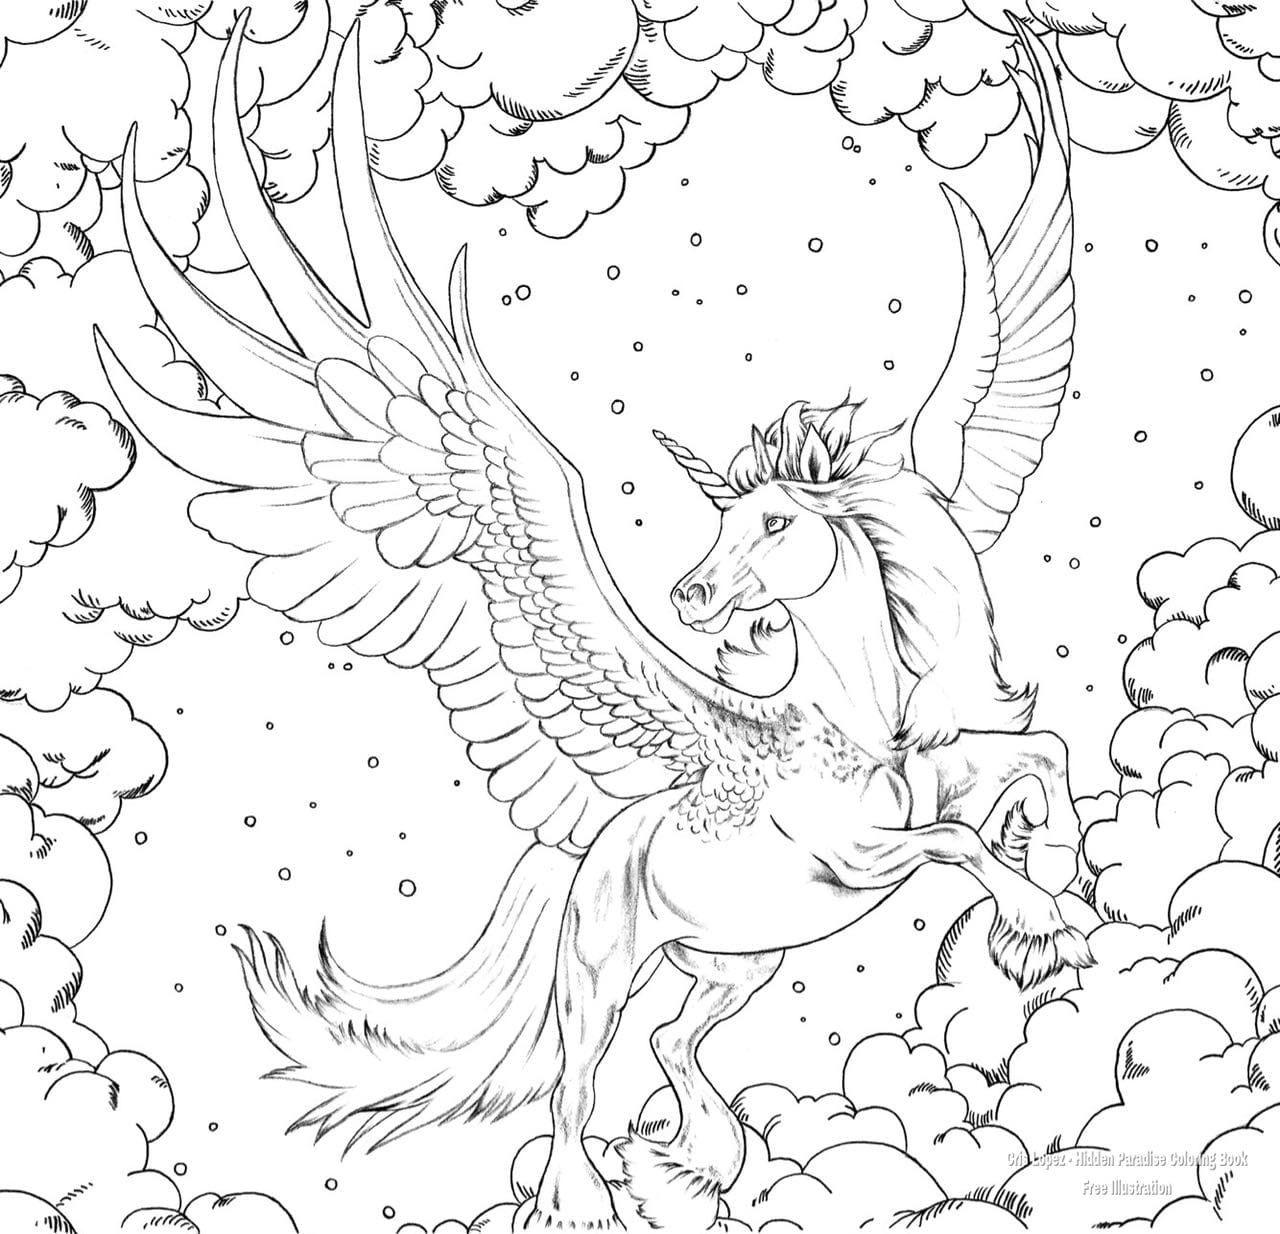 Pin By Sarah Verschueren On Drawings Mermaid Coloring Pages Horse Coloring Pages Cute Coloring Pages [ 1234 x 1280 Pixel ]